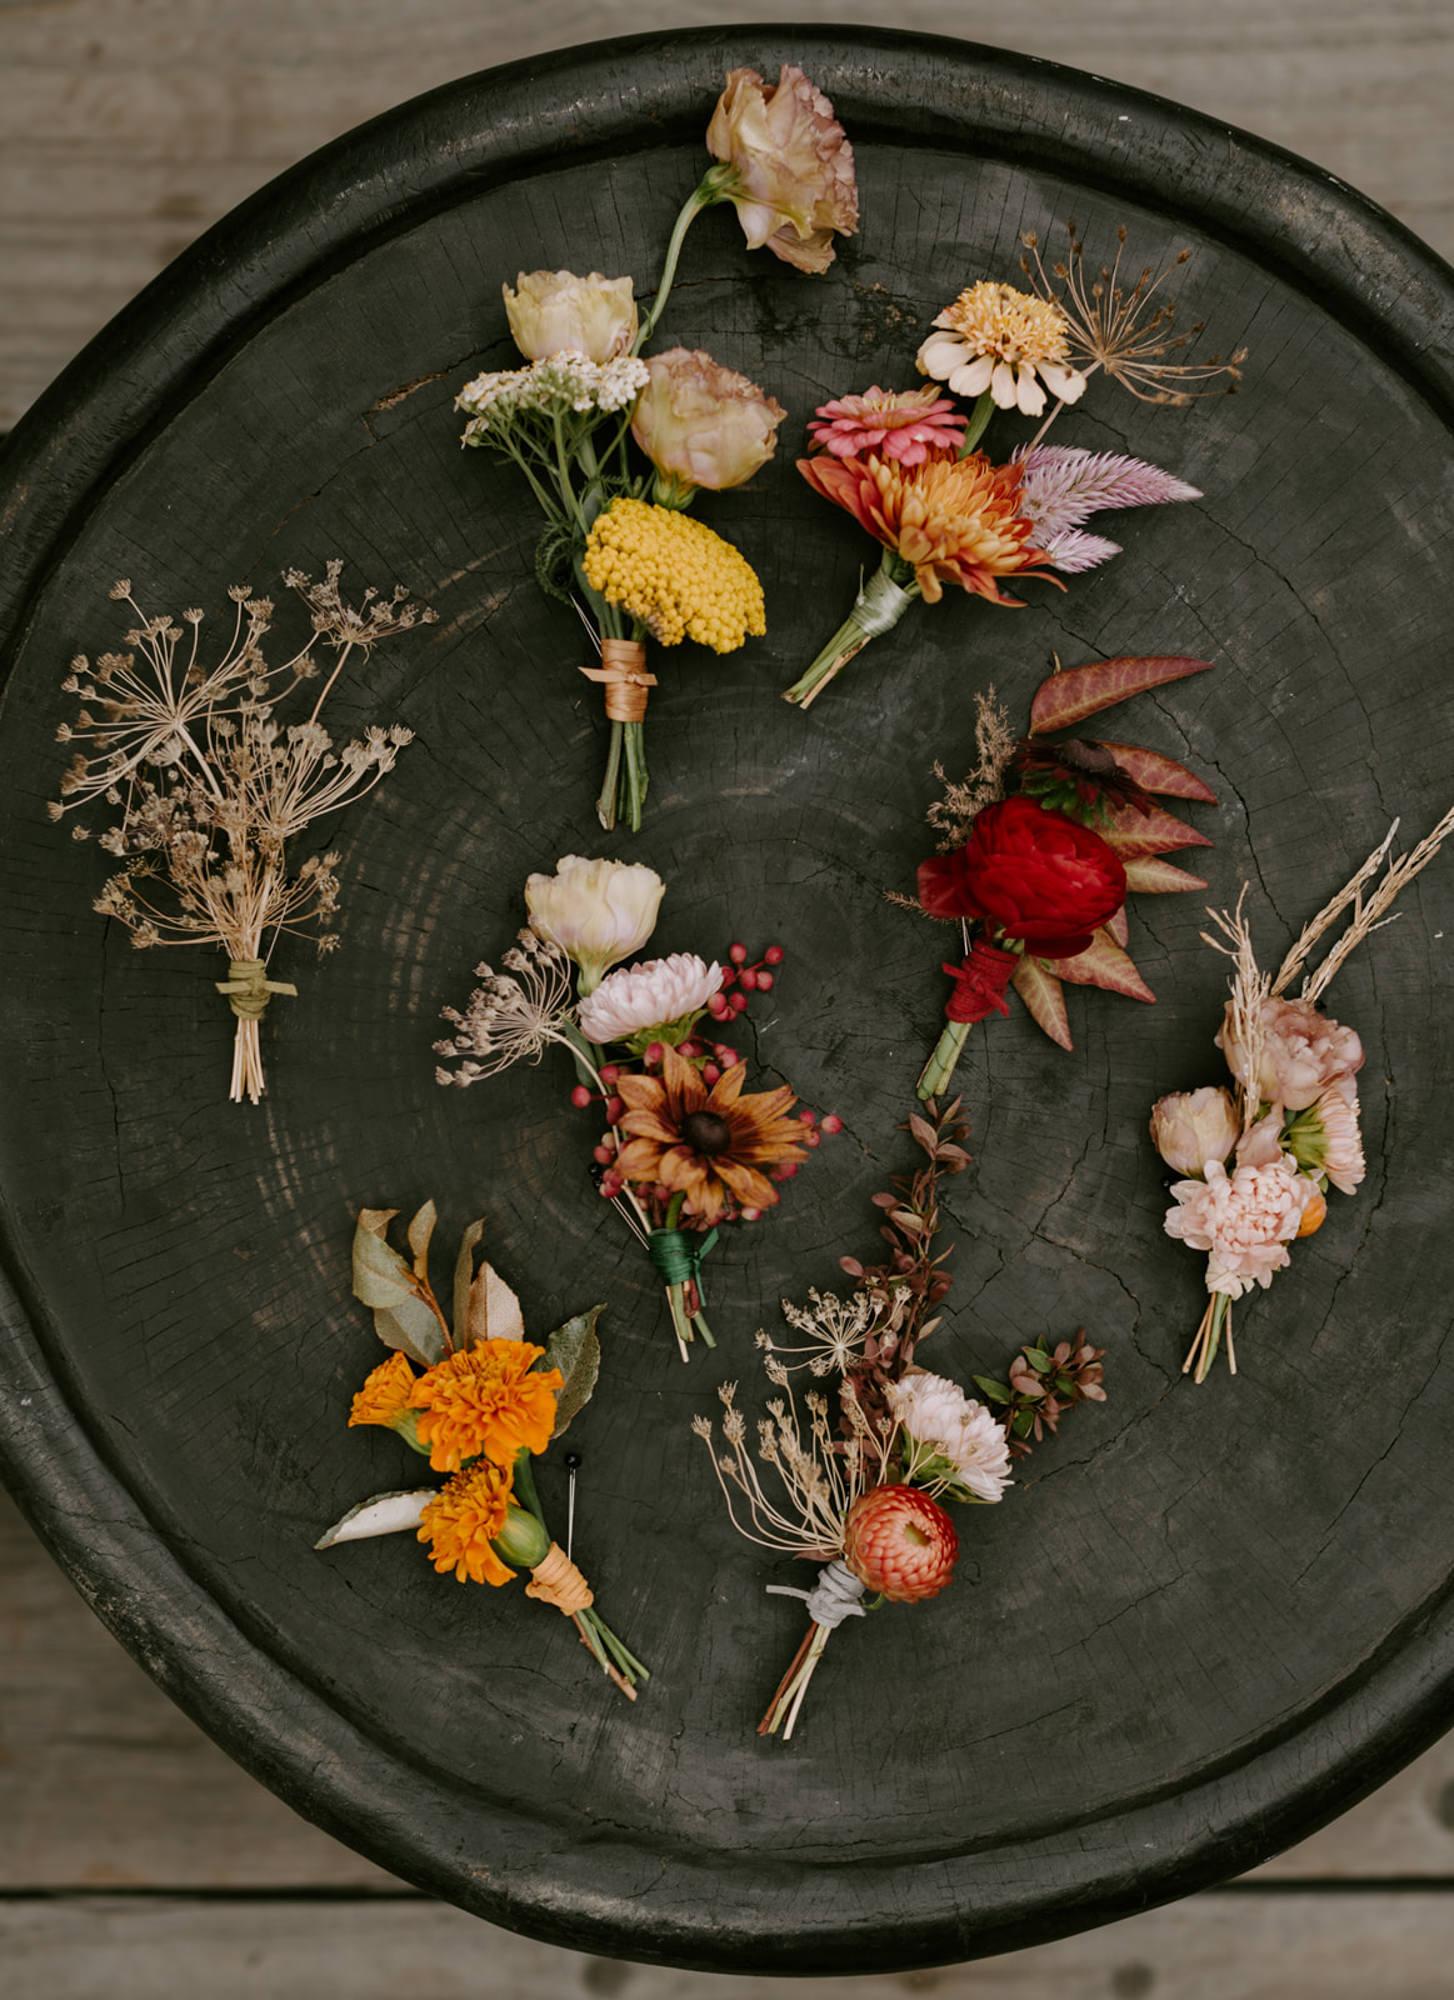 late-summer-rustic-boutonnieres-marigold-dahlia-black-eyed-susan-worlds-best-wedding-photographers-kristen-marie-parker-seattle-wedding-photographers